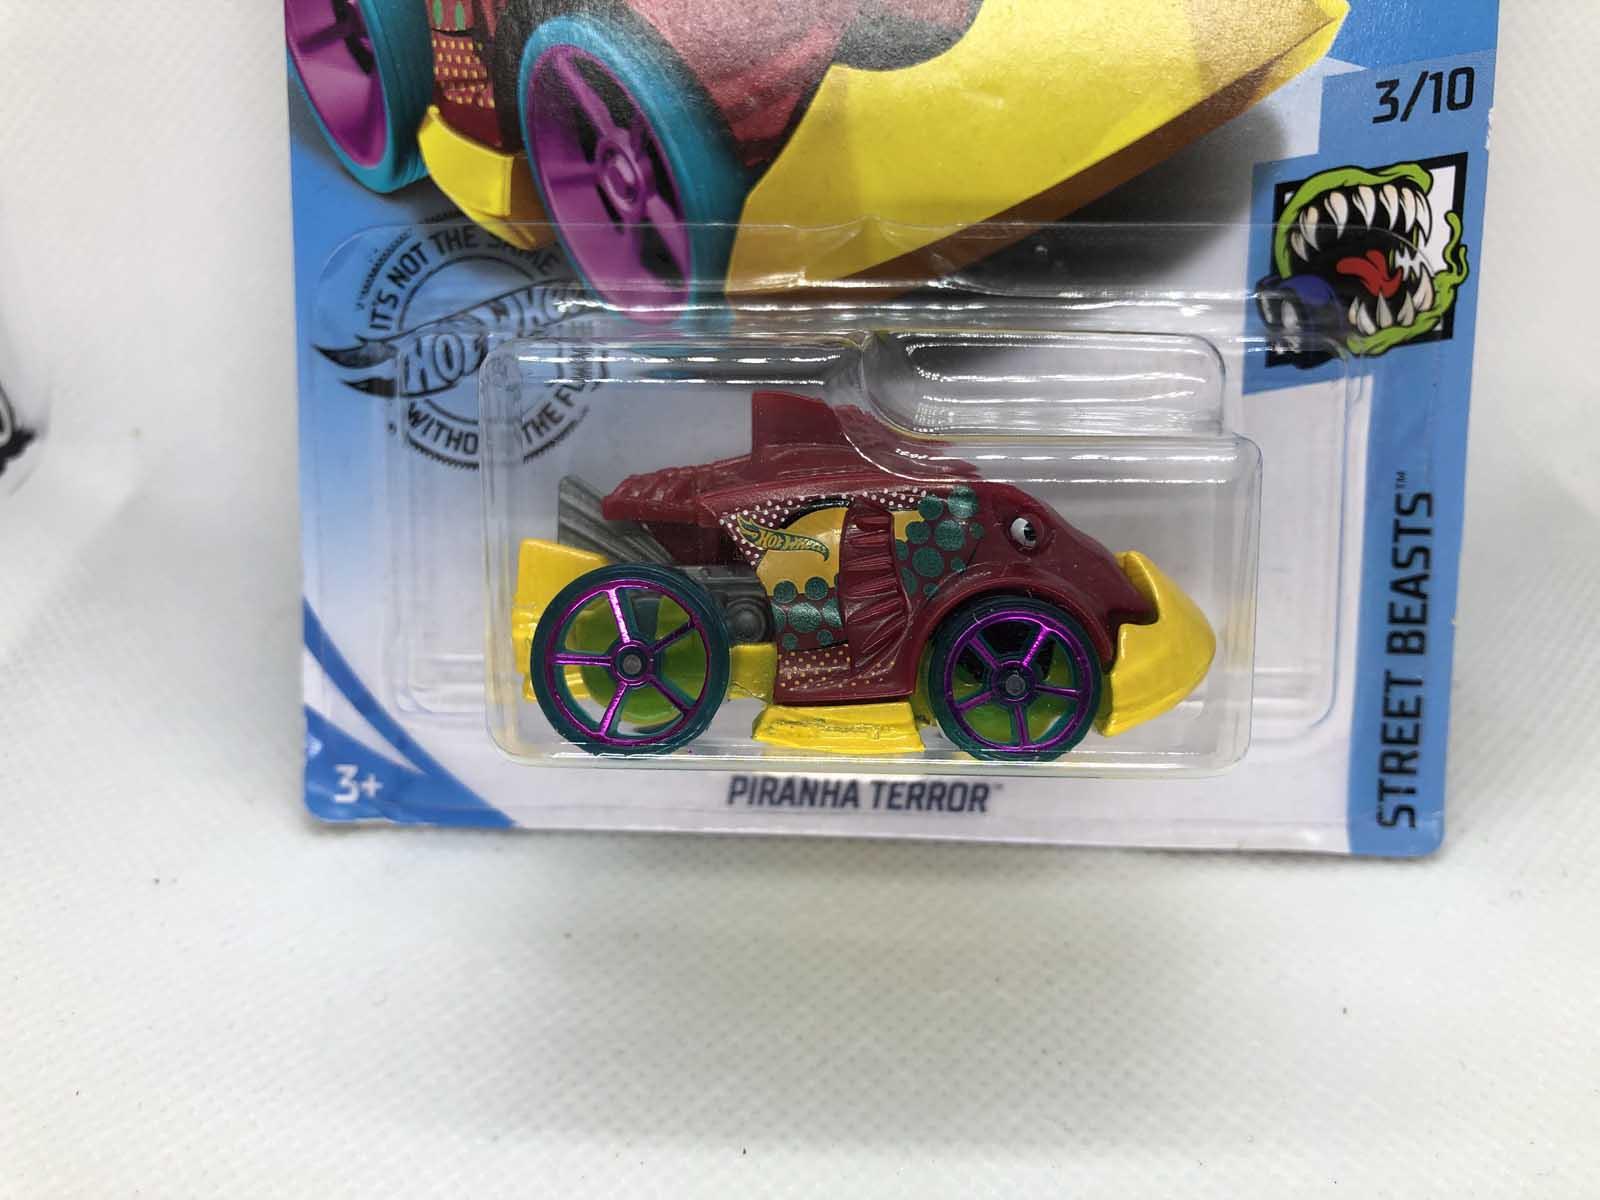 Piranha Terror